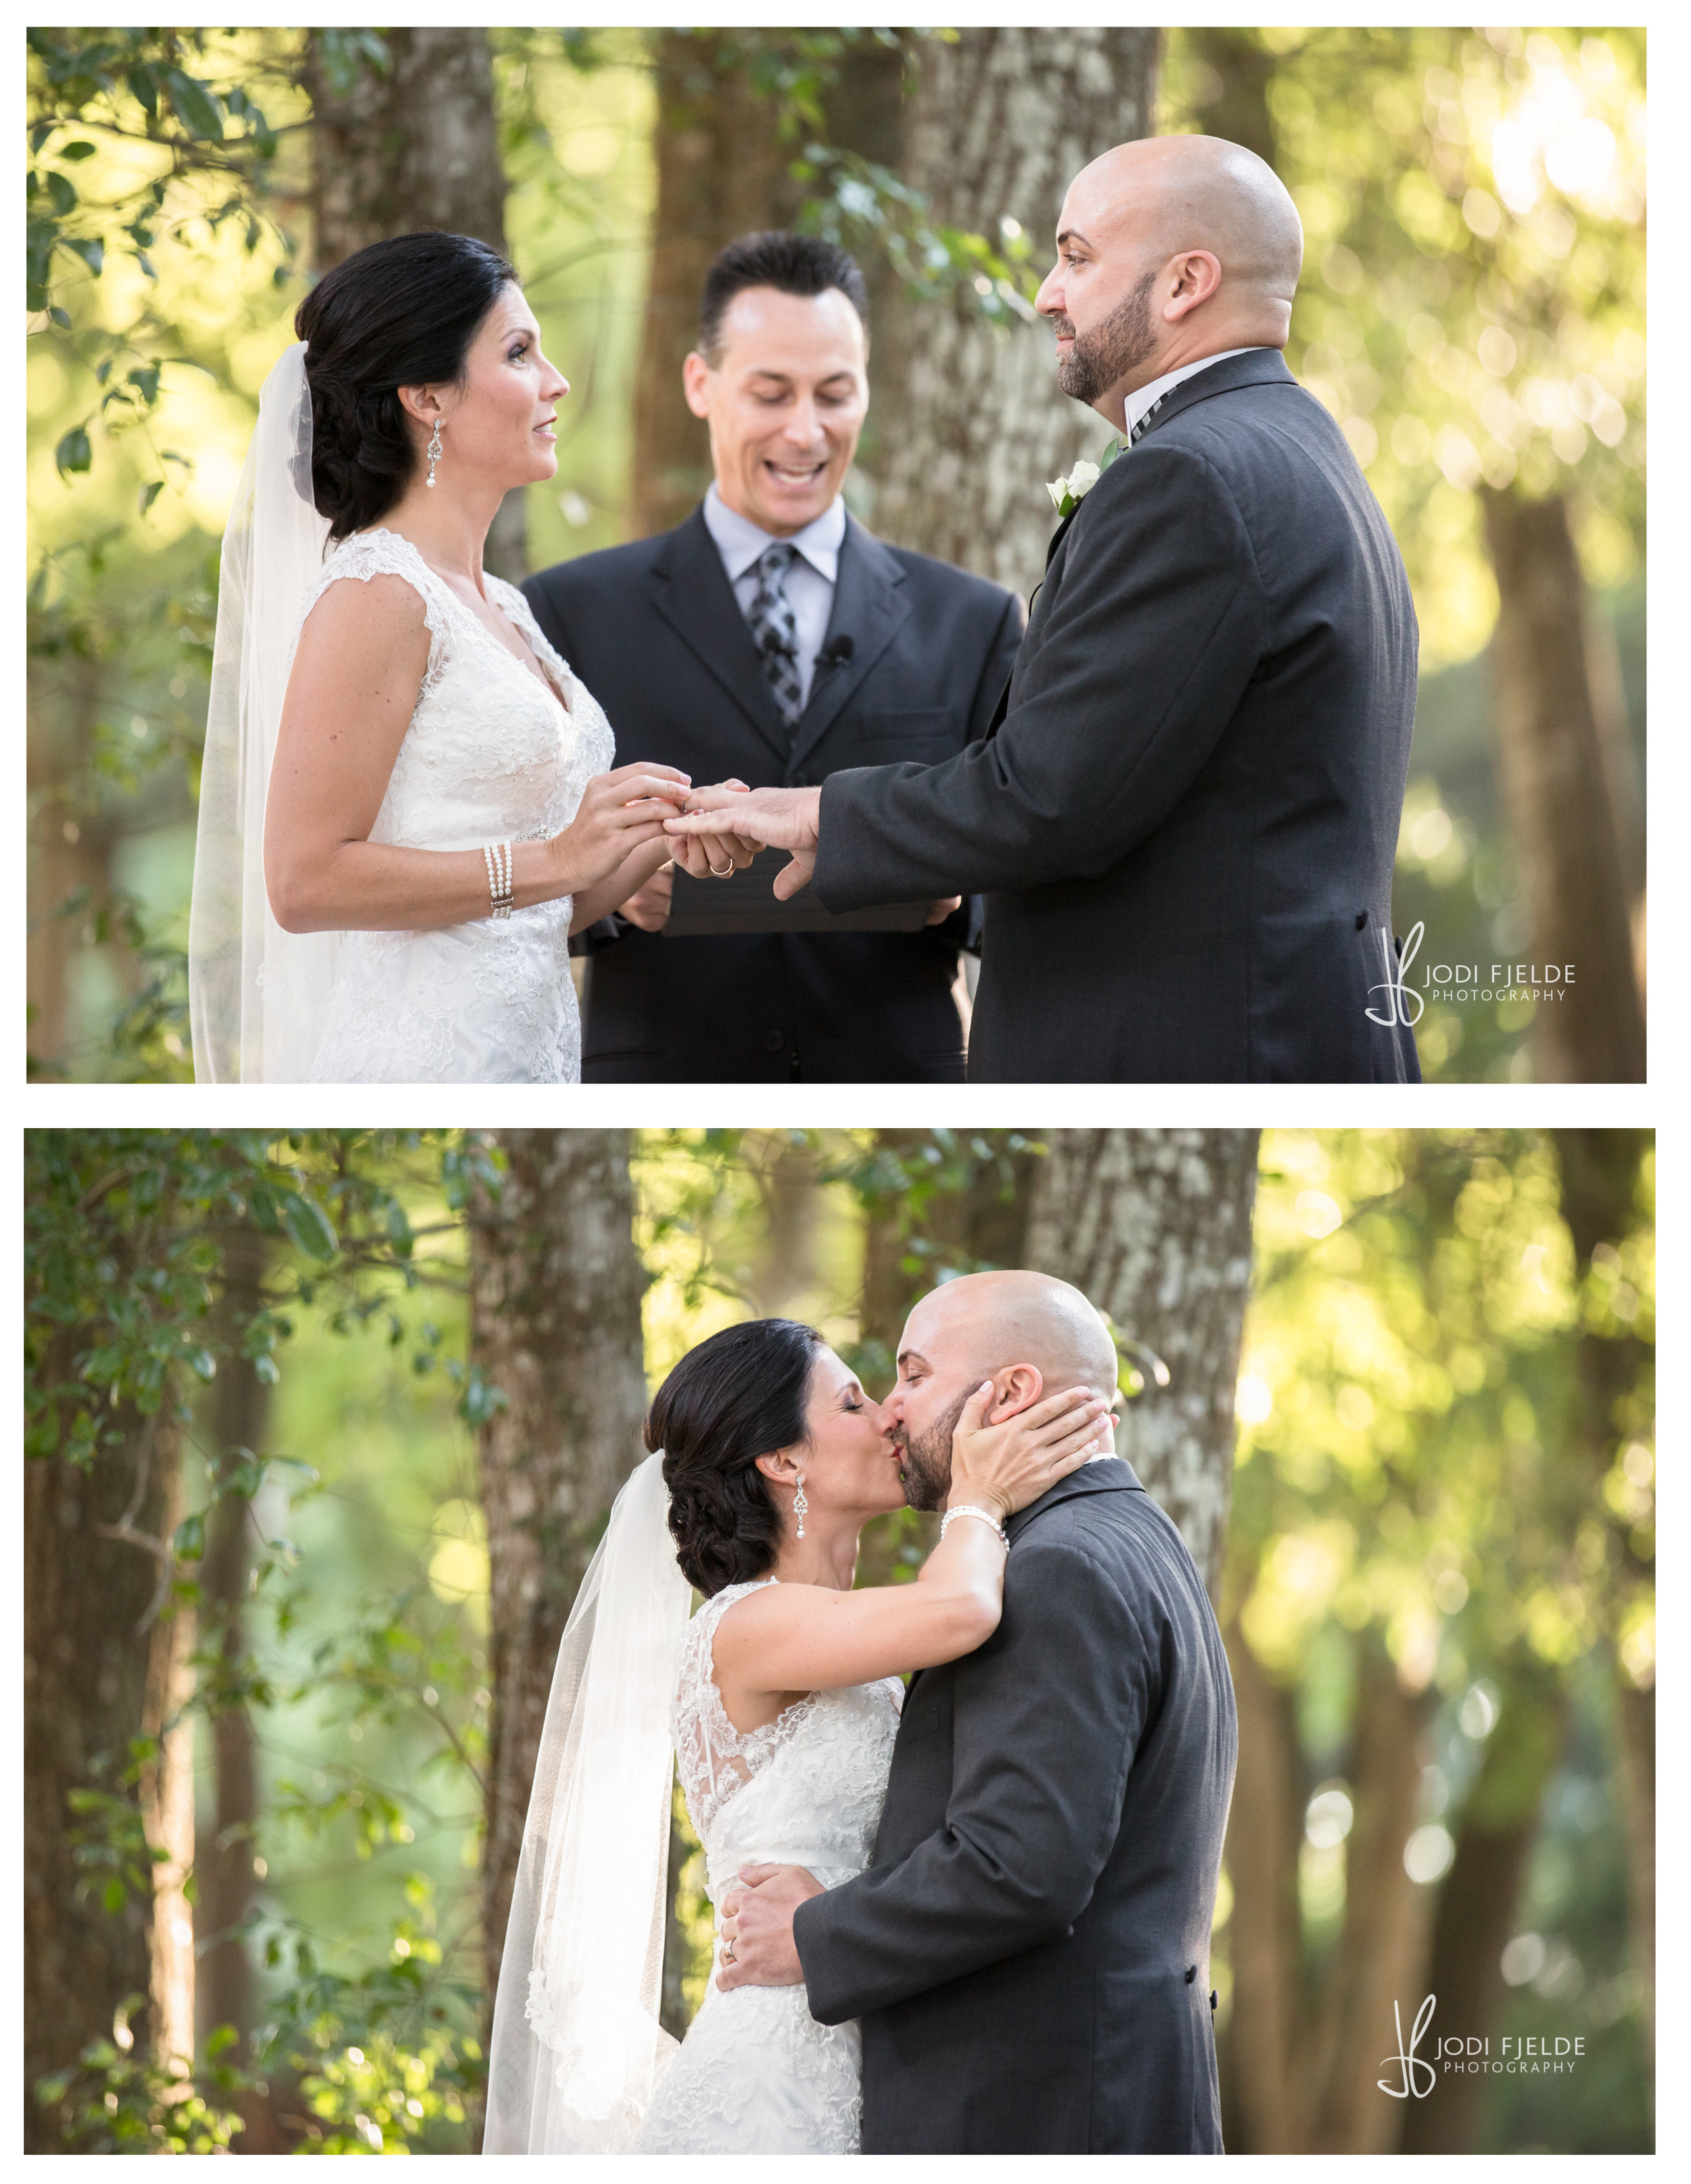 Highland_Manor_Apopka_Florida_wedding_Jackie_&_Tim_photography_jodi_Fjelde_photography-17.jpg